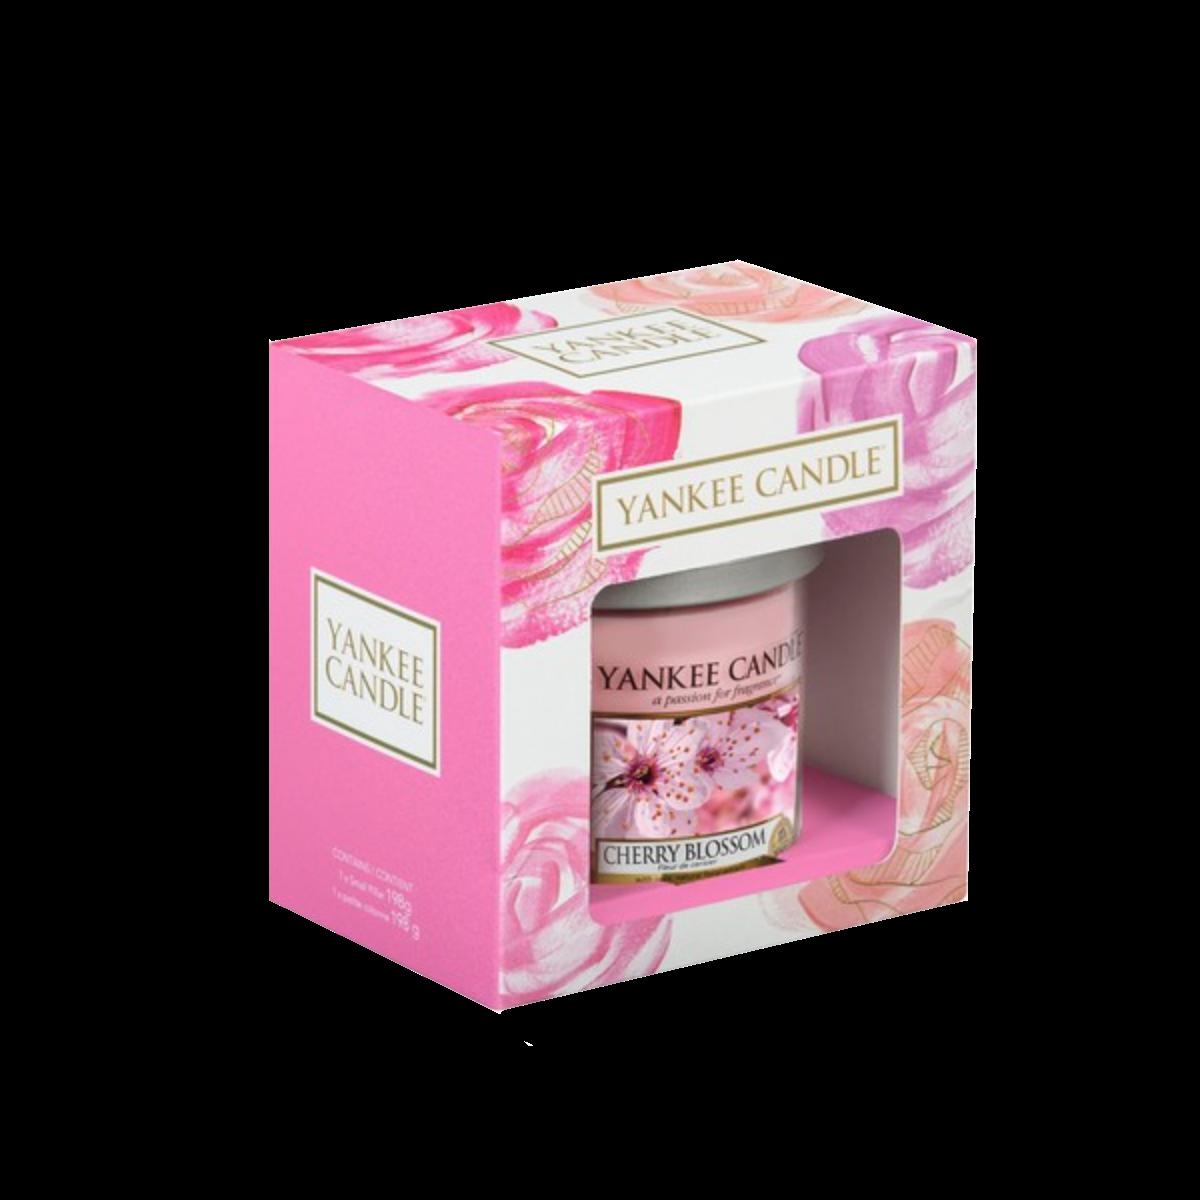 yankee candle | coffret cadeau | cherry blossom - bougie parfumée